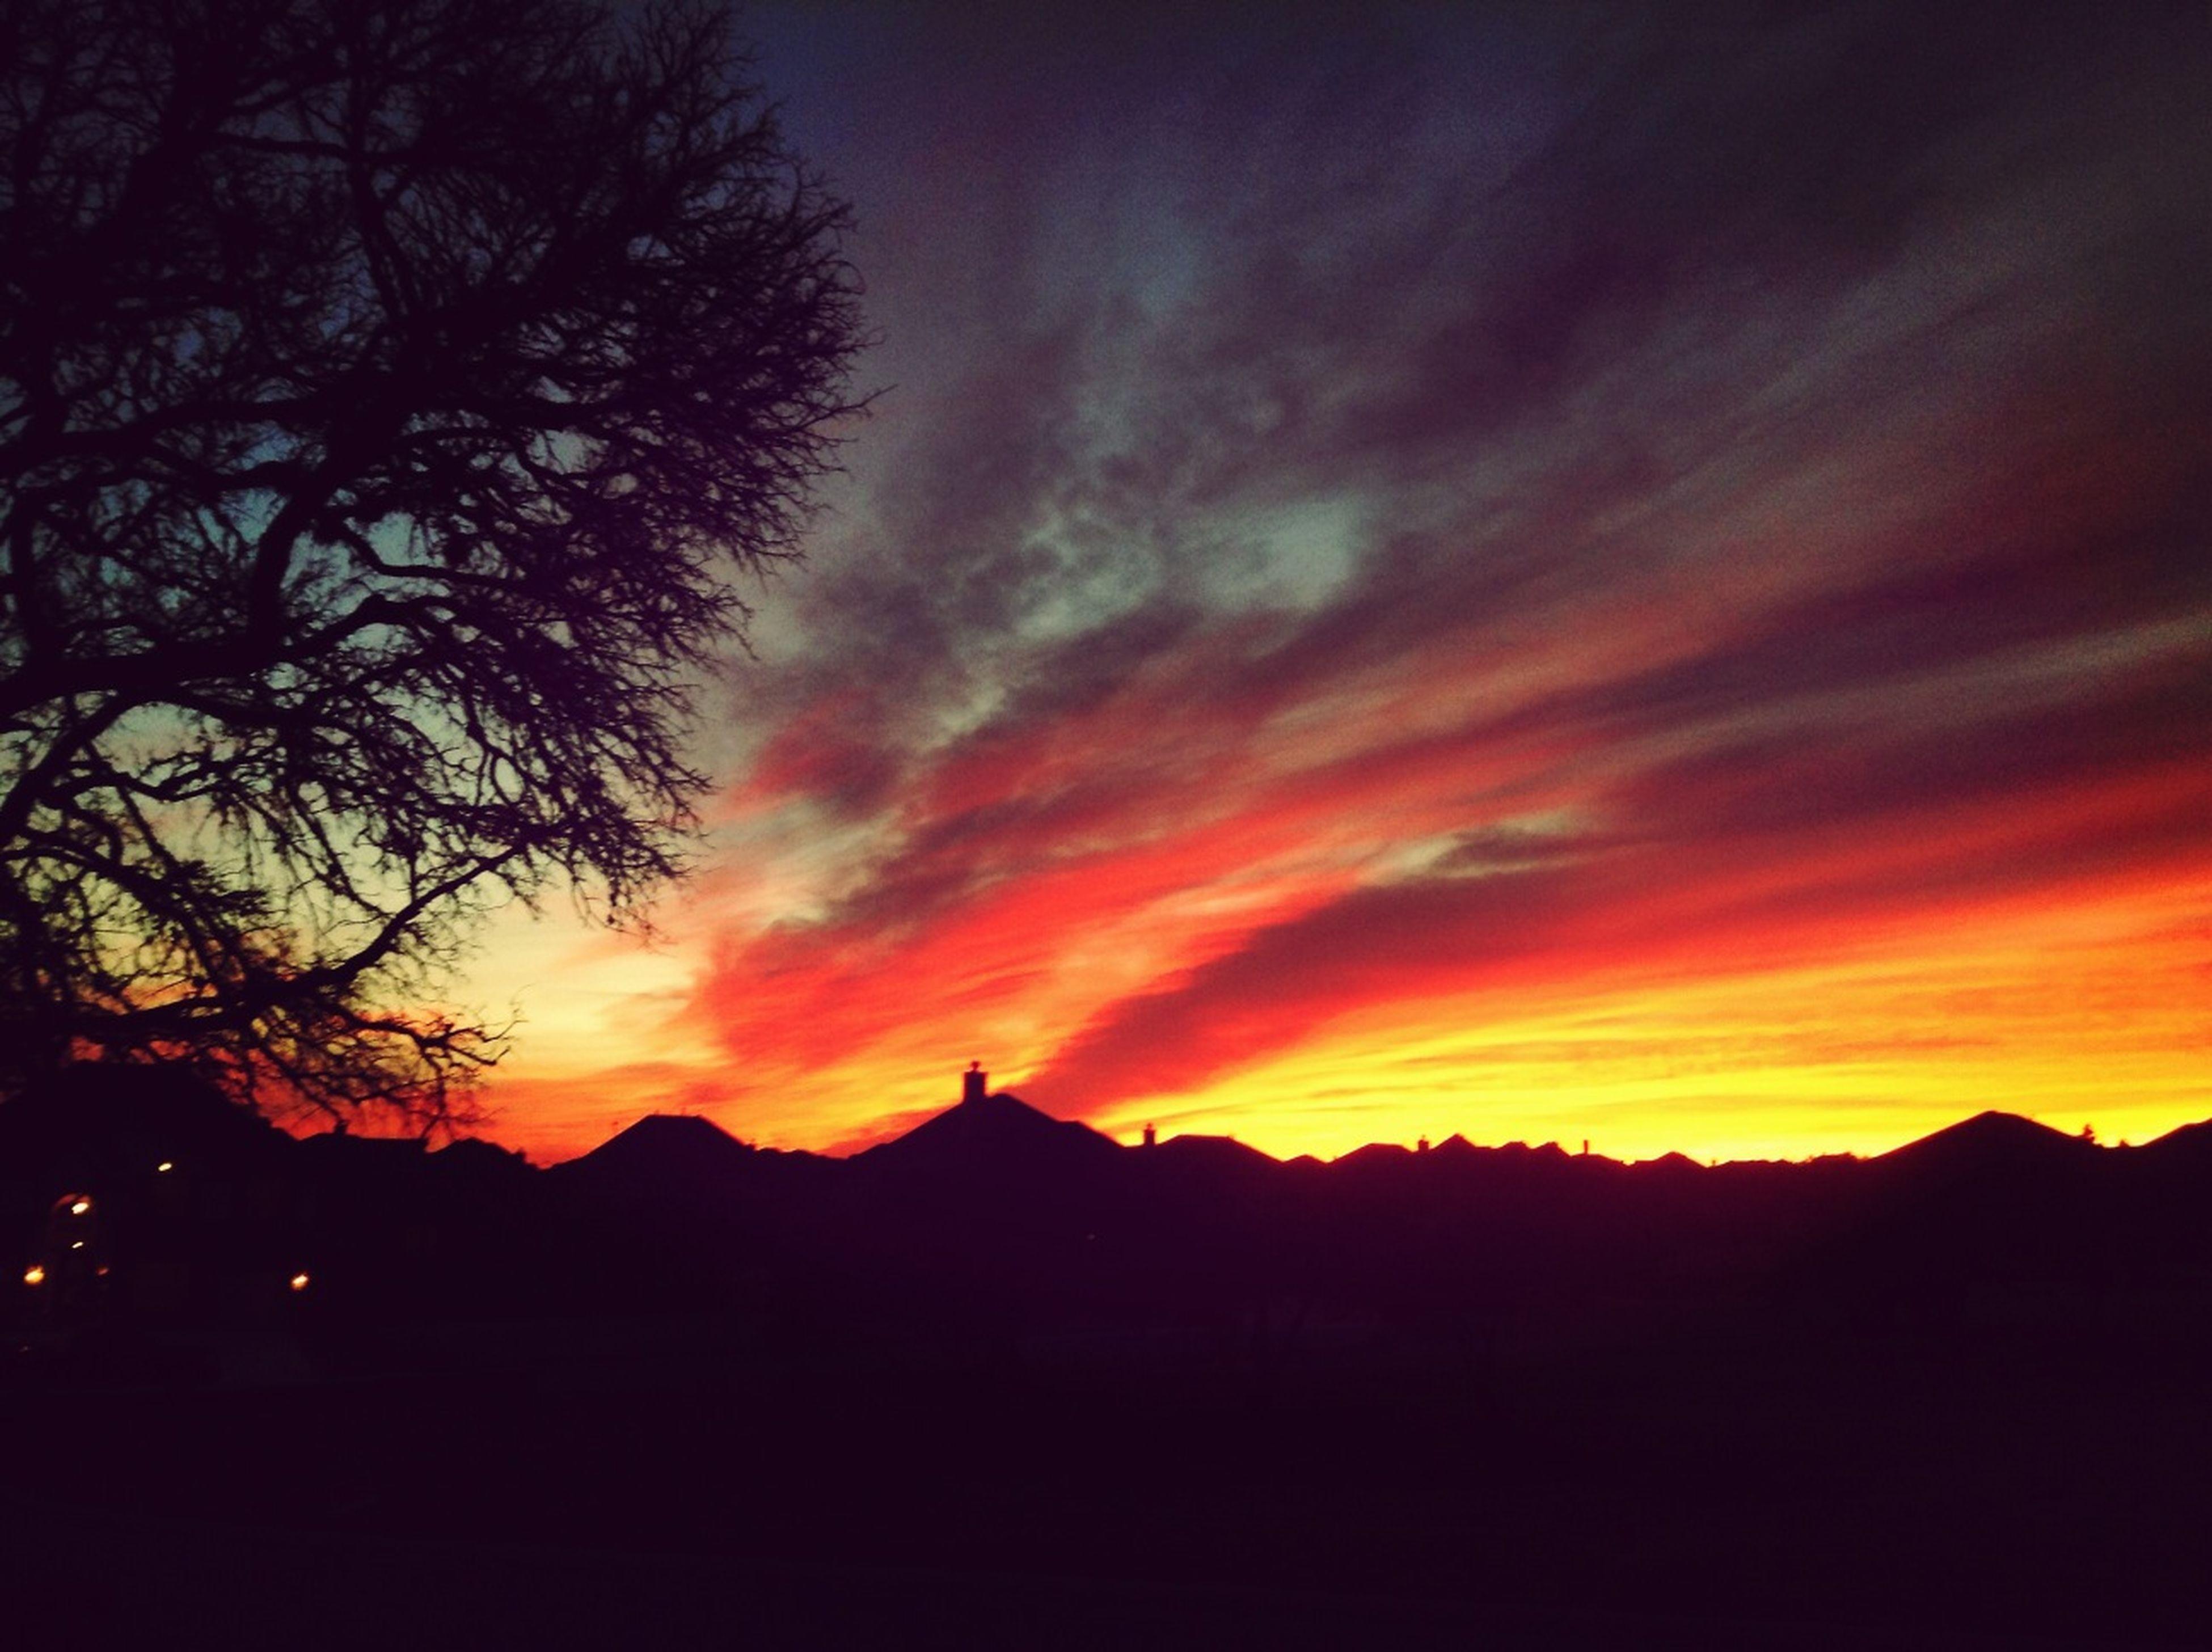 sunset, silhouette, scenics, tranquil scene, beauty in nature, tranquility, sky, orange color, tree, nature, idyllic, dramatic sky, landscape, mountain, cloud - sky, majestic, dark, cloud, dusk, moody sky